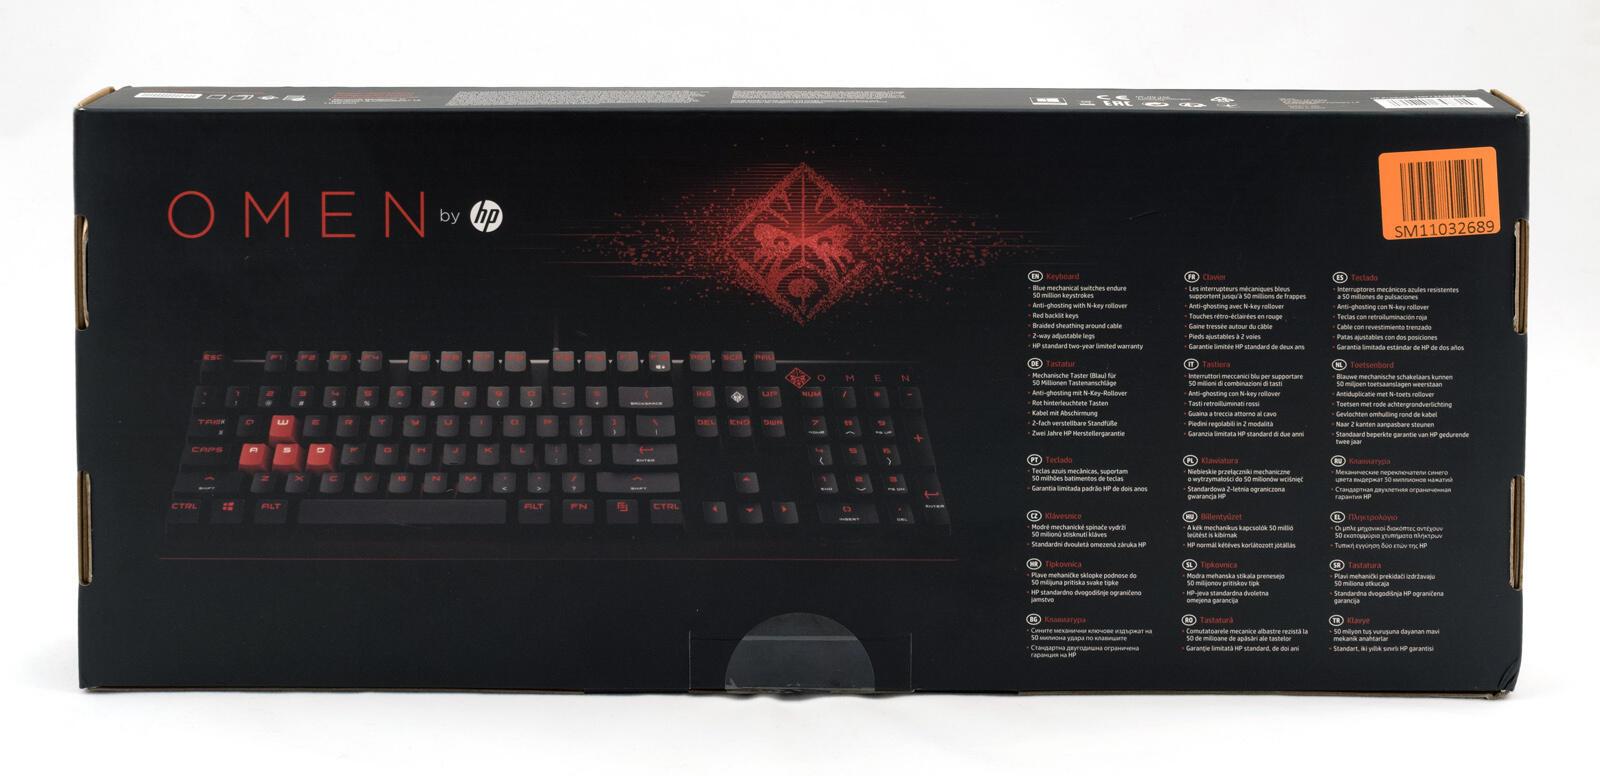 Periferiya - Obzor igrovoy klaviatury OMEN by HP Keyboard 1100